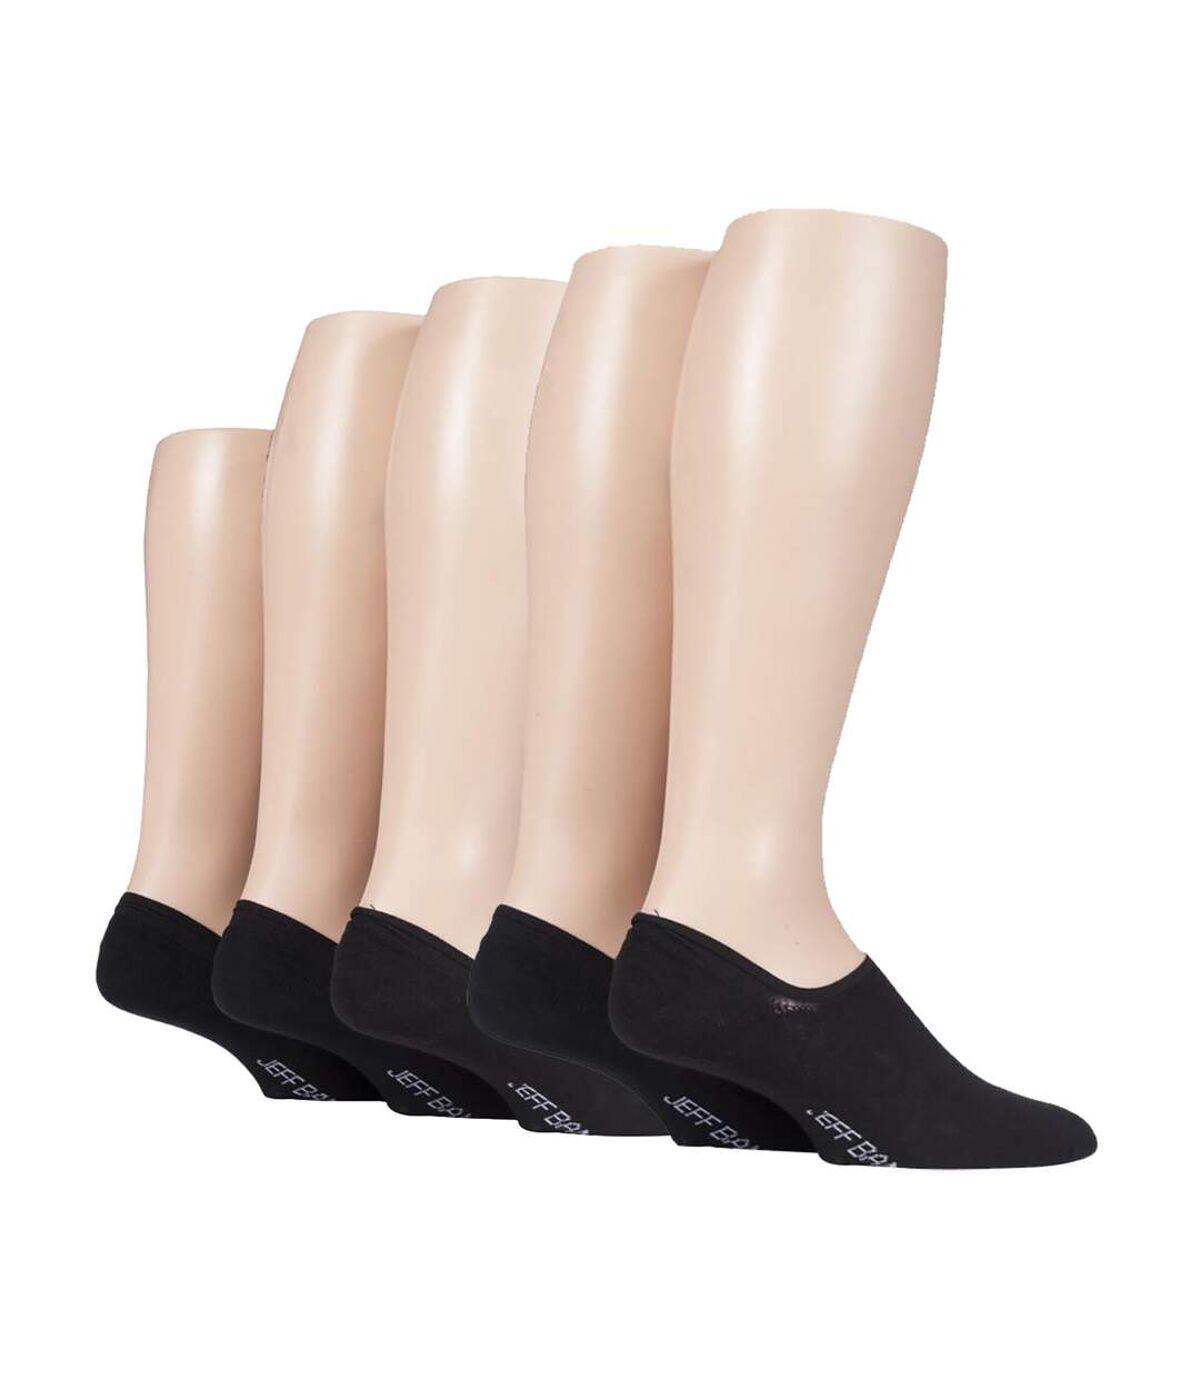 Jeff Banks - 5 Pk Mens Cotton Low Cut Invisbile Socks